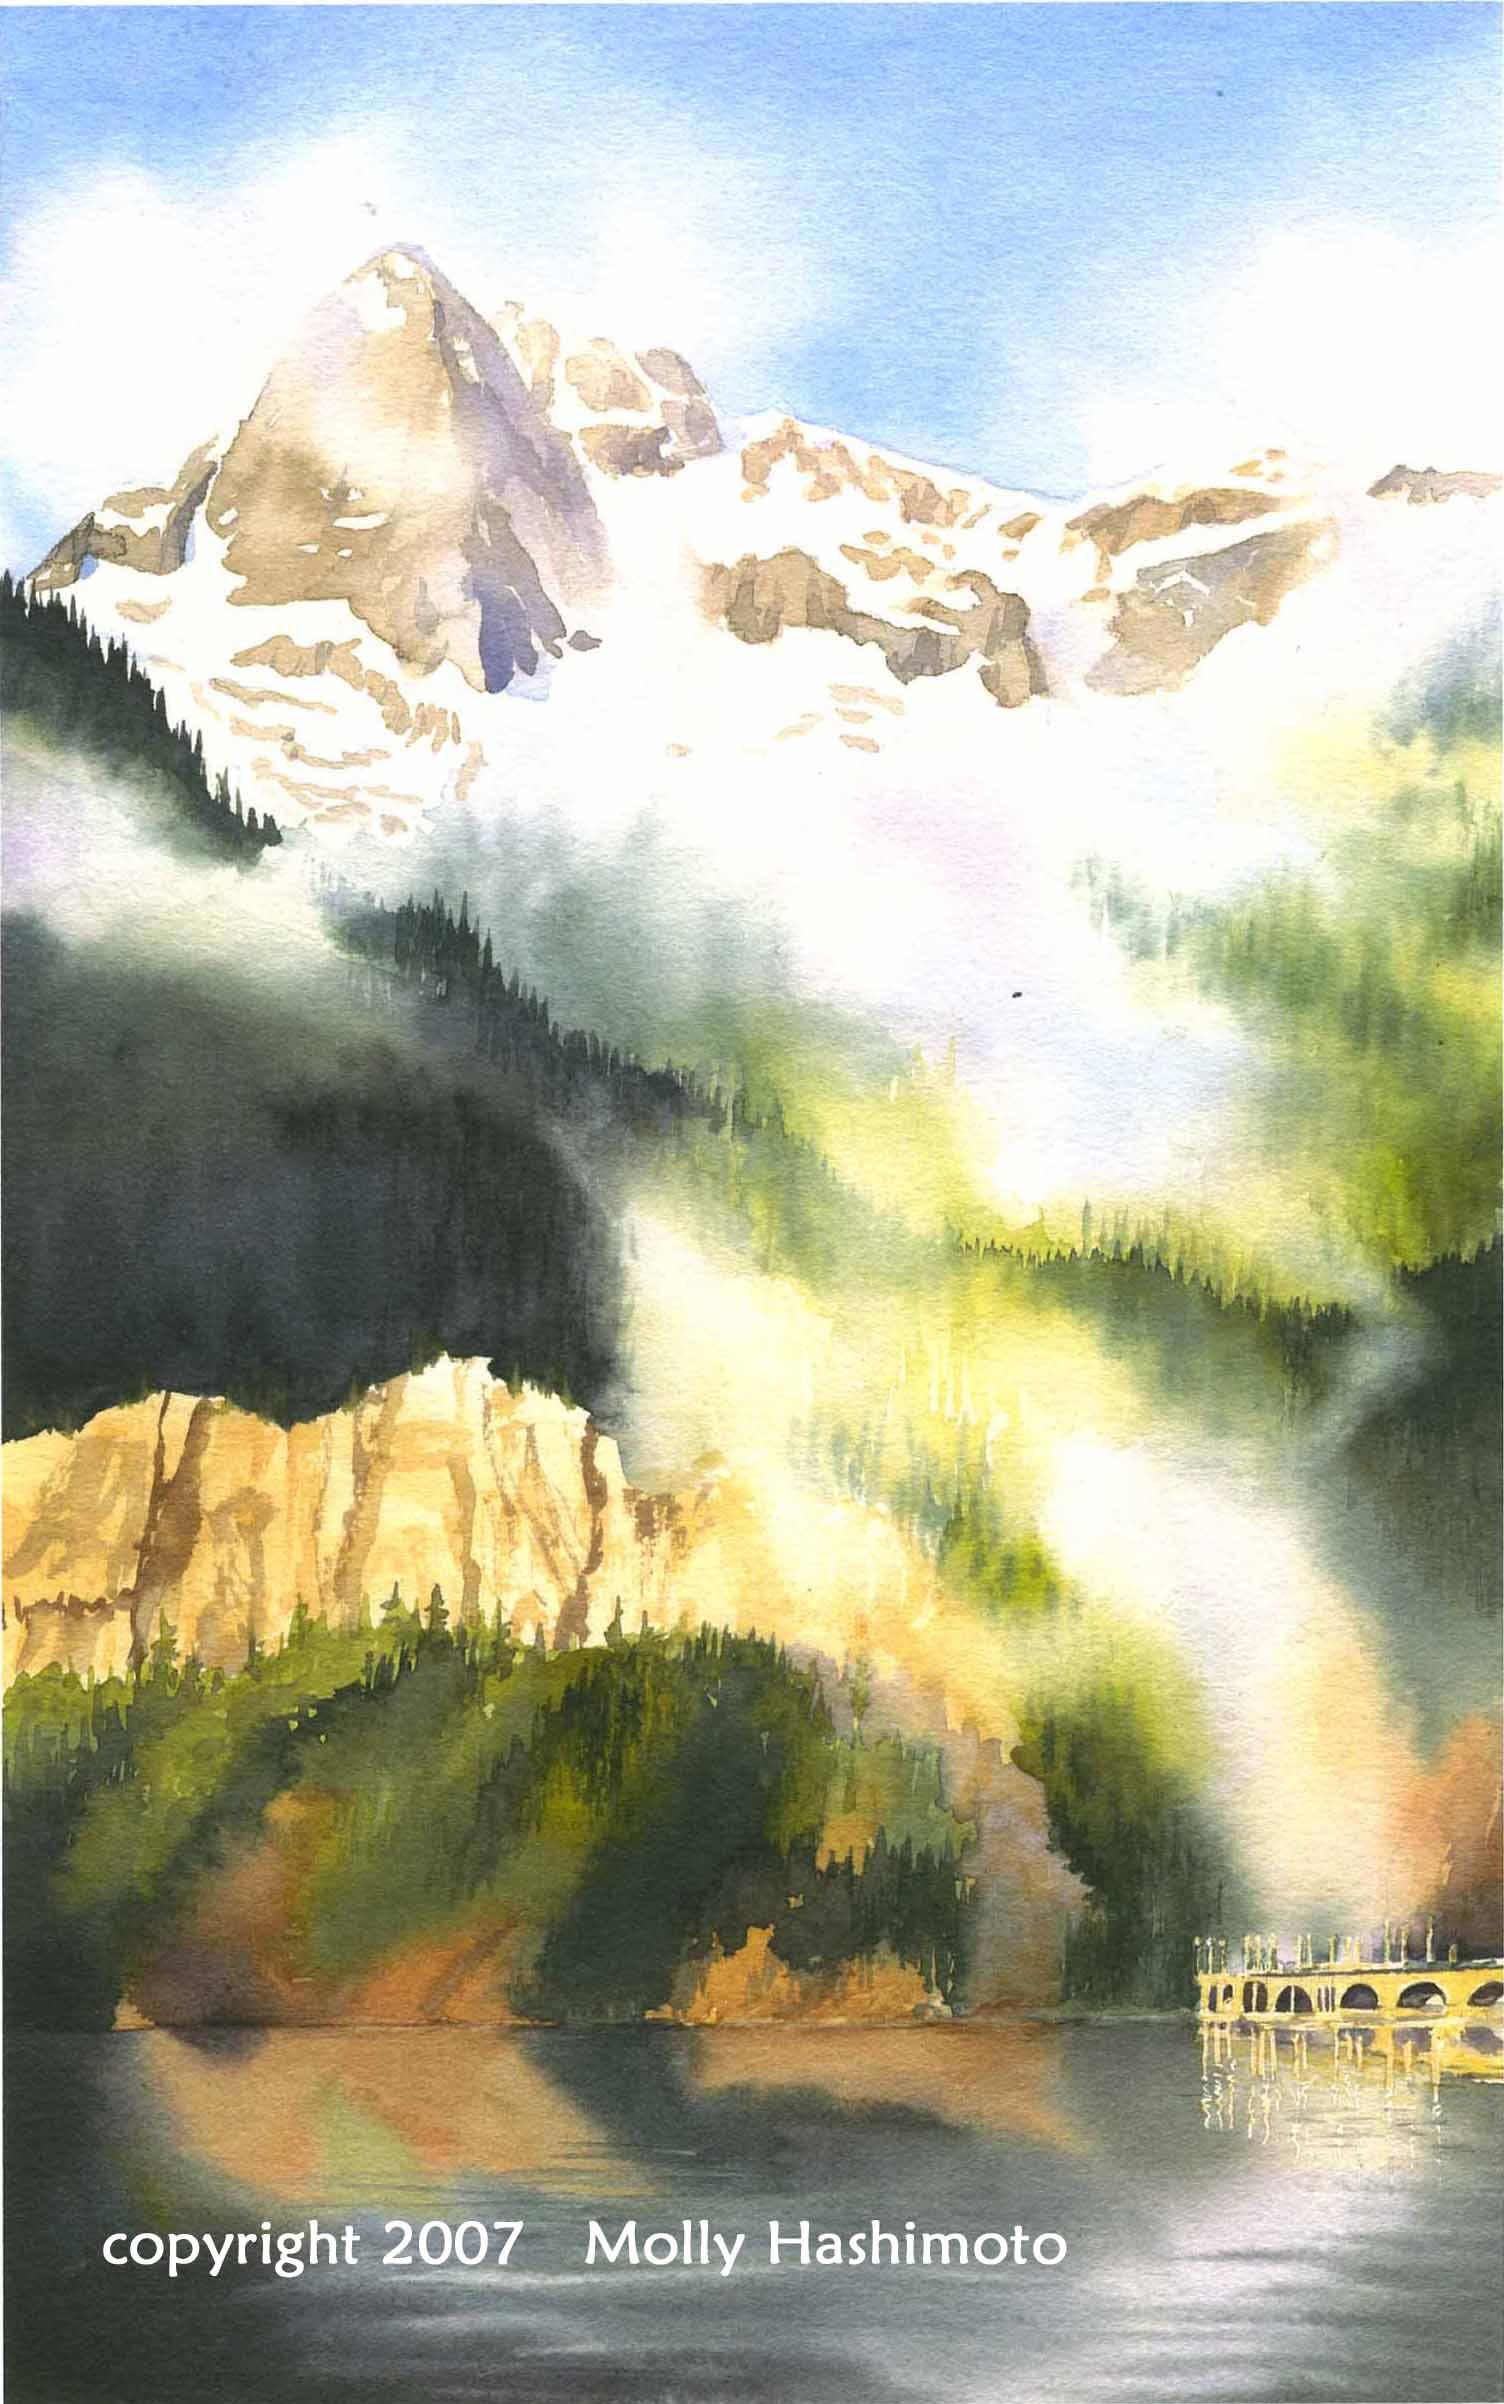 Peak, Mist, Dam - Giclee Print $75